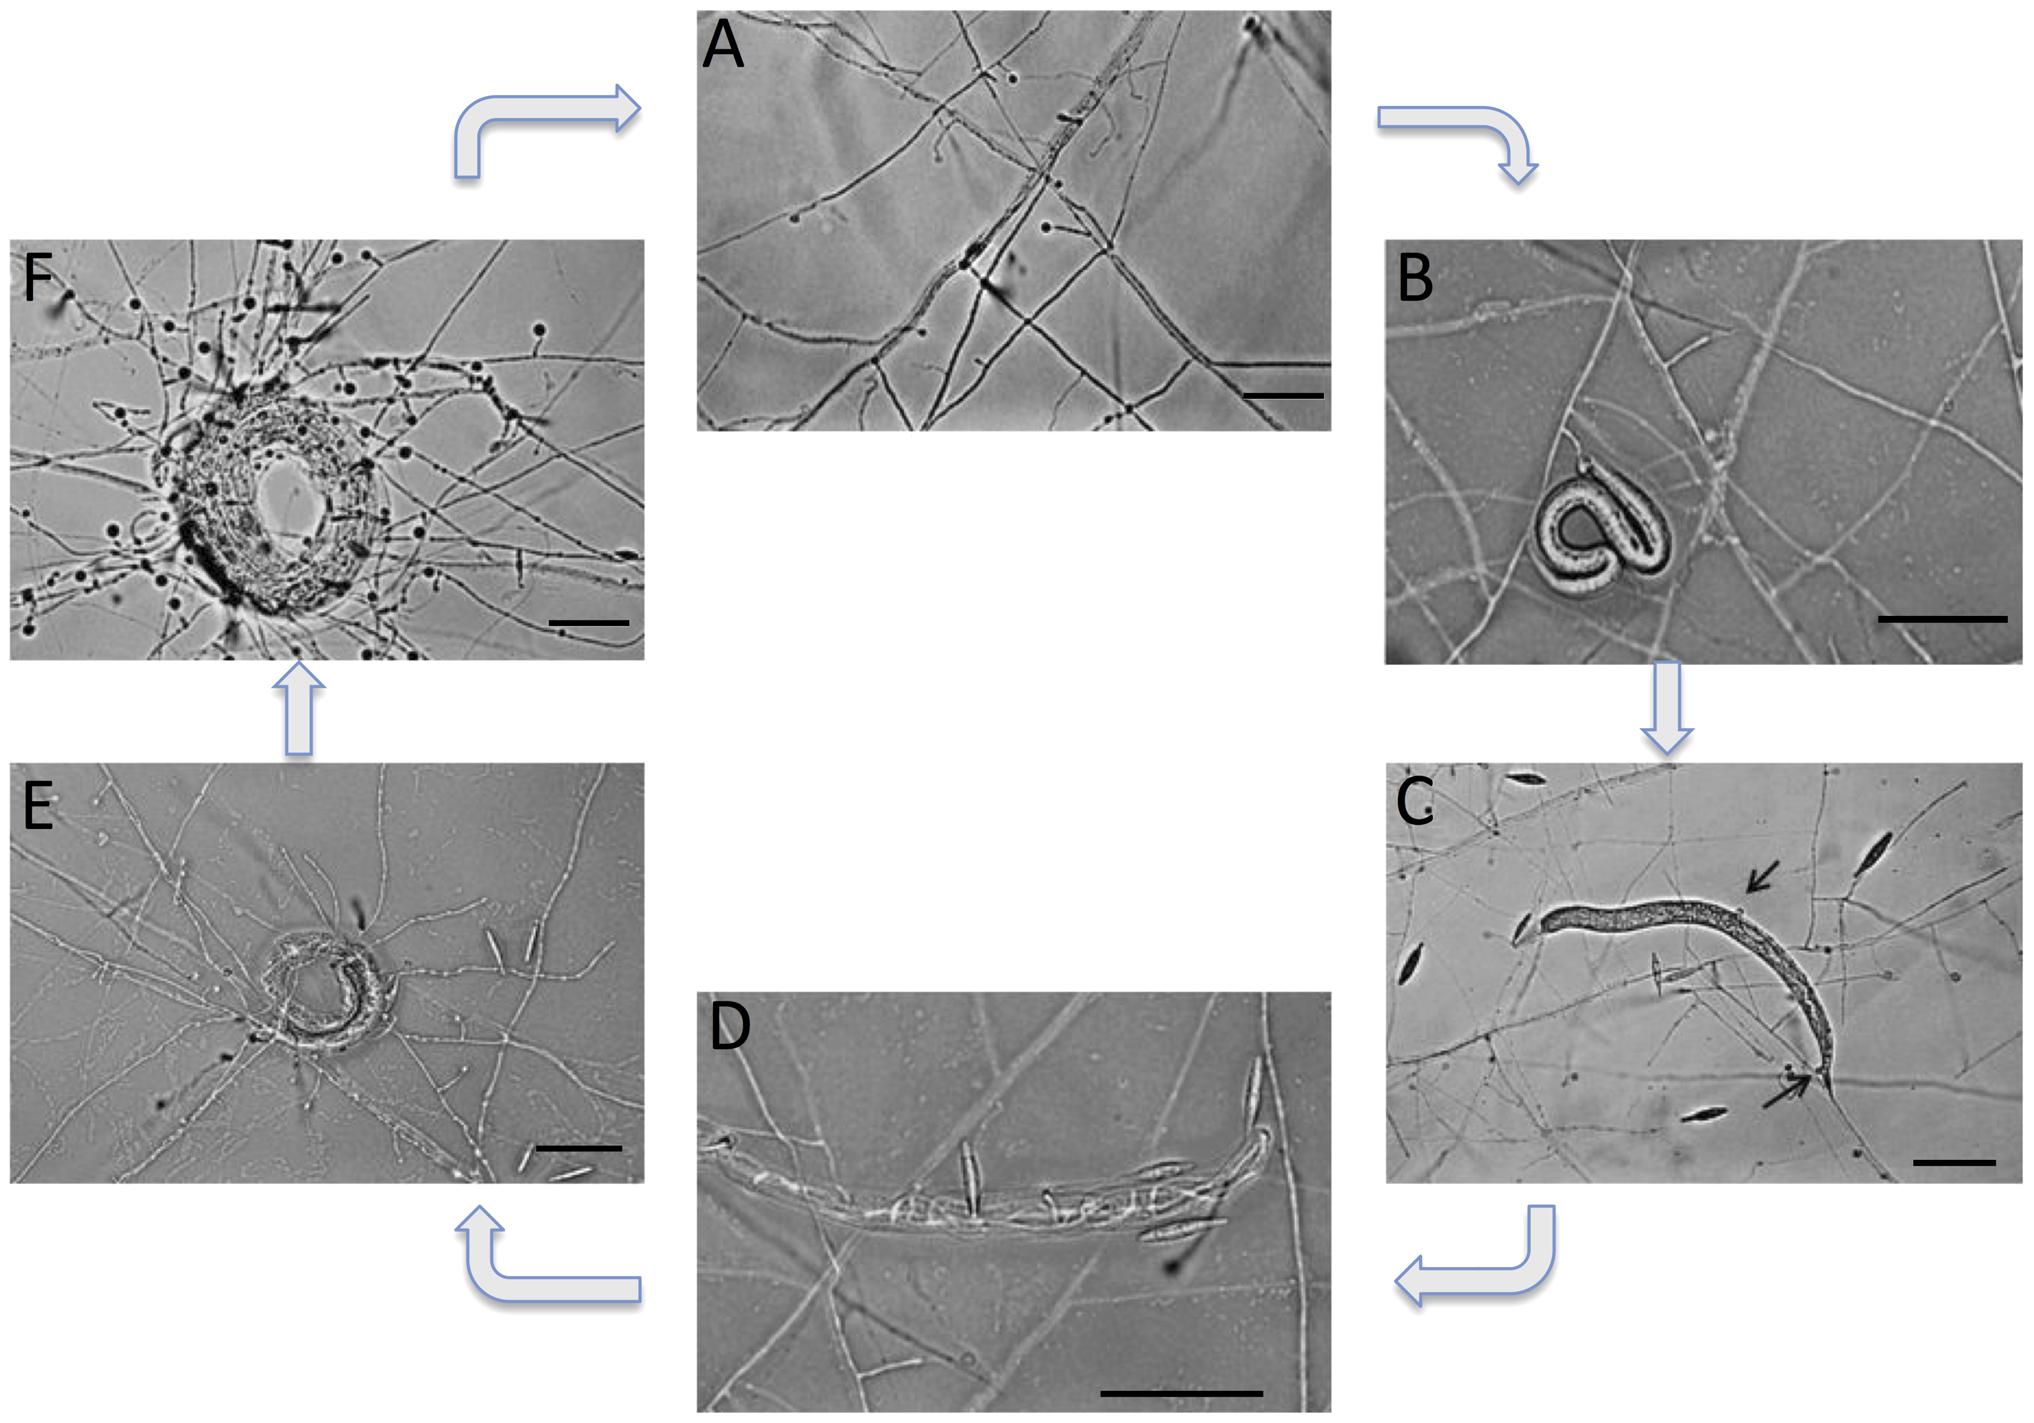 Life cycle of the nematode-trapping fungus <i>M. haptotylum</i>.